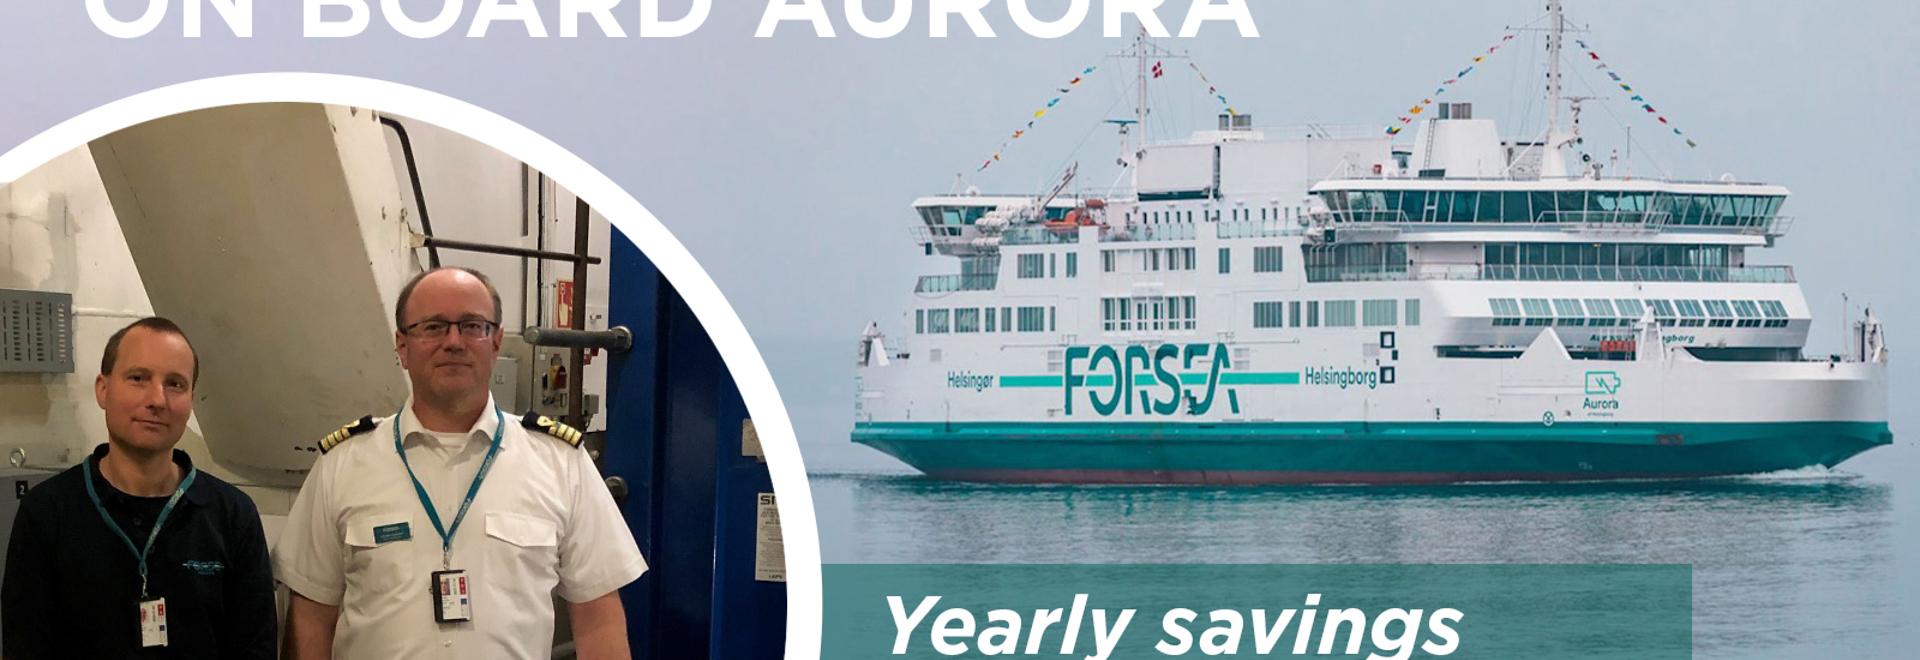 Energy Savings on Board Aurora